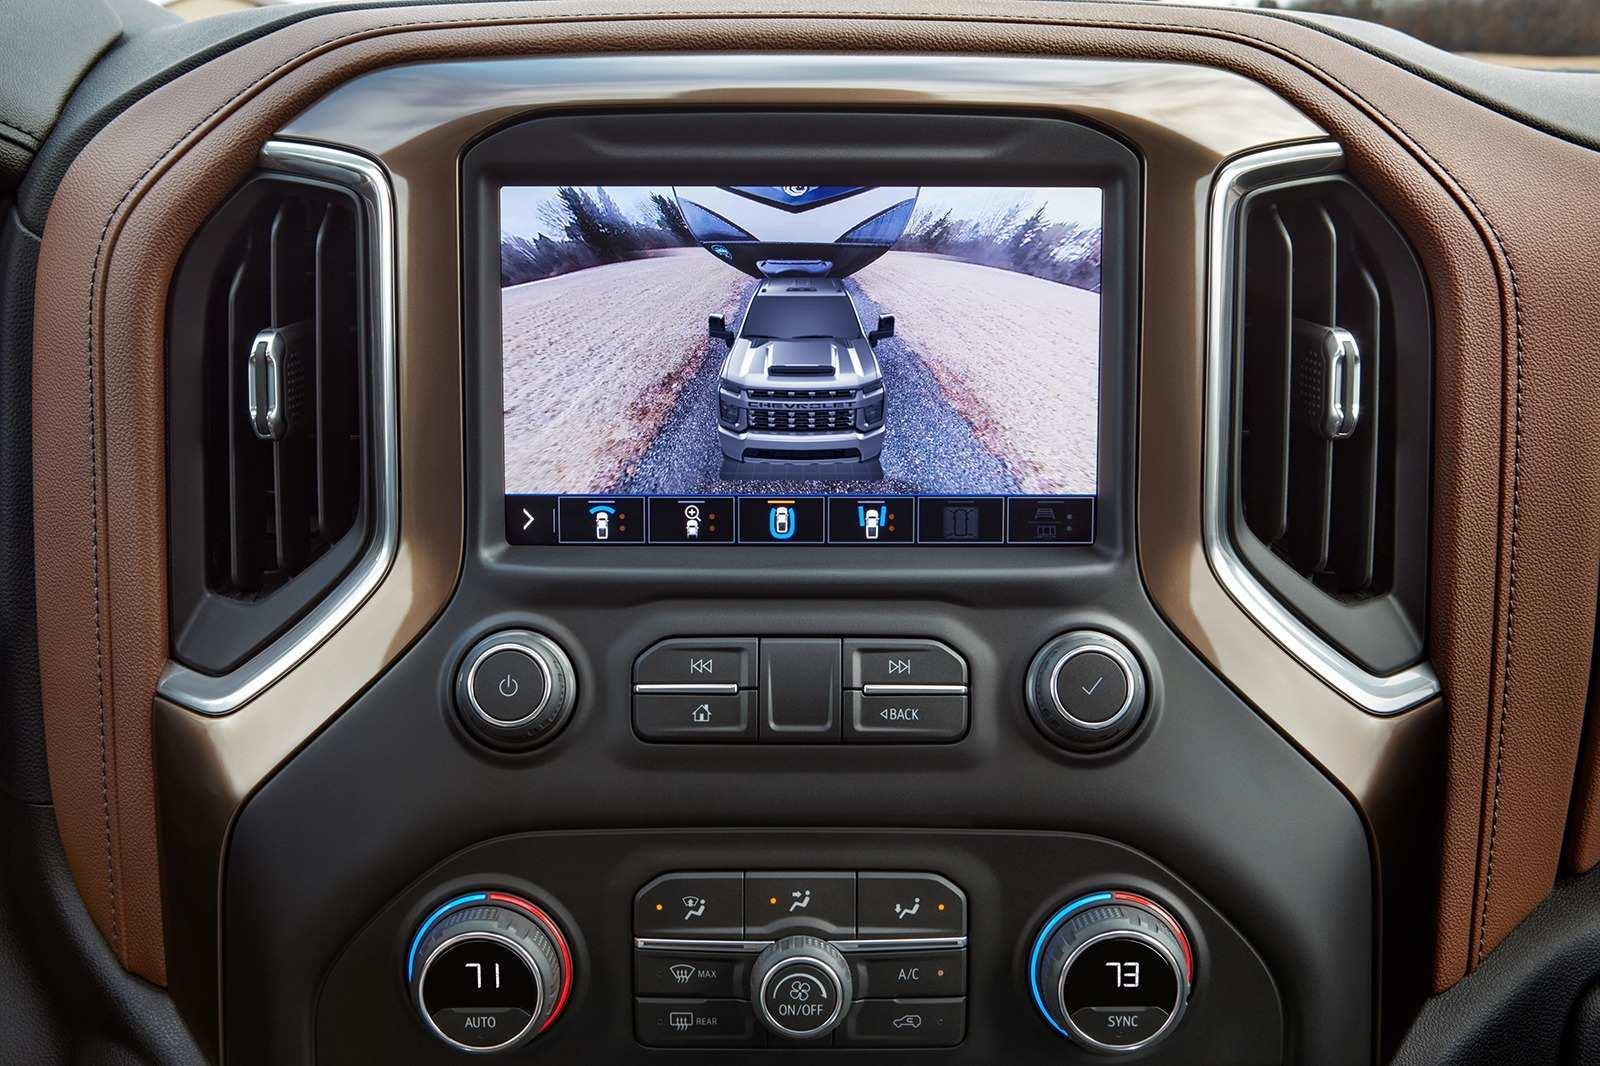 80 Gallery of Chevrolet Silverado 2020 Release Date Wallpaper by Chevrolet Silverado 2020 Release Date